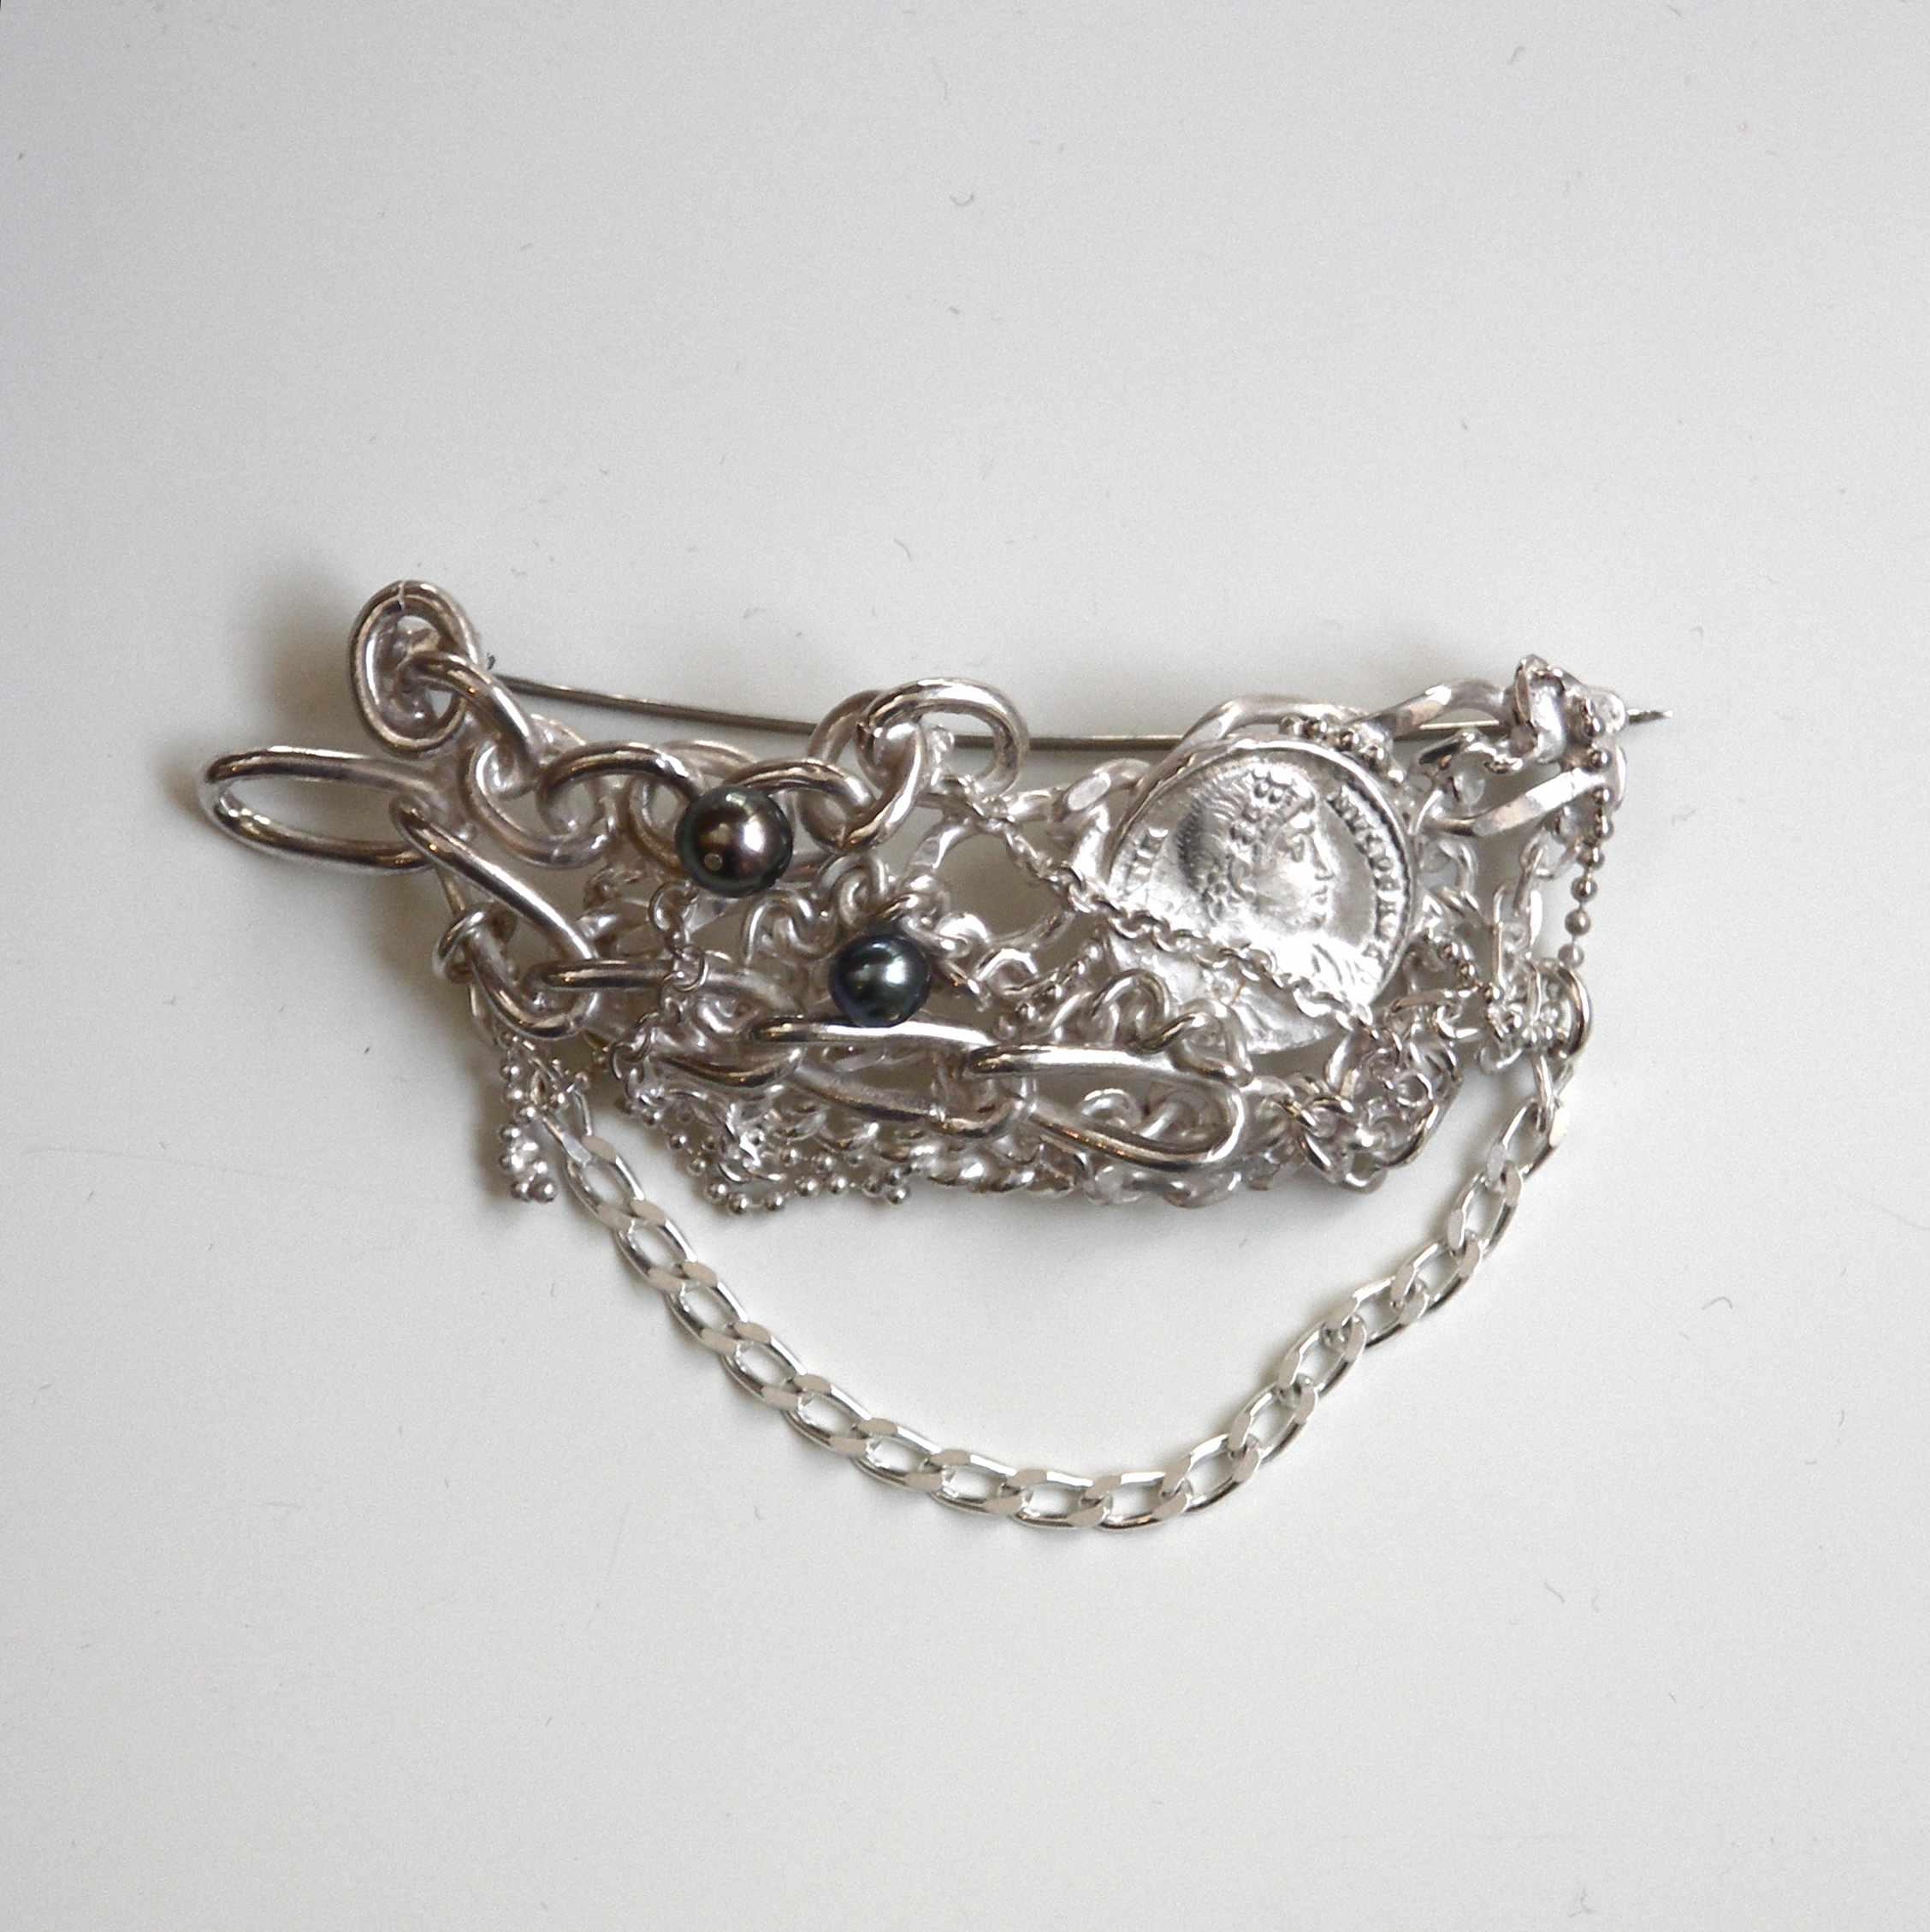 TCP-Tangled chain pin